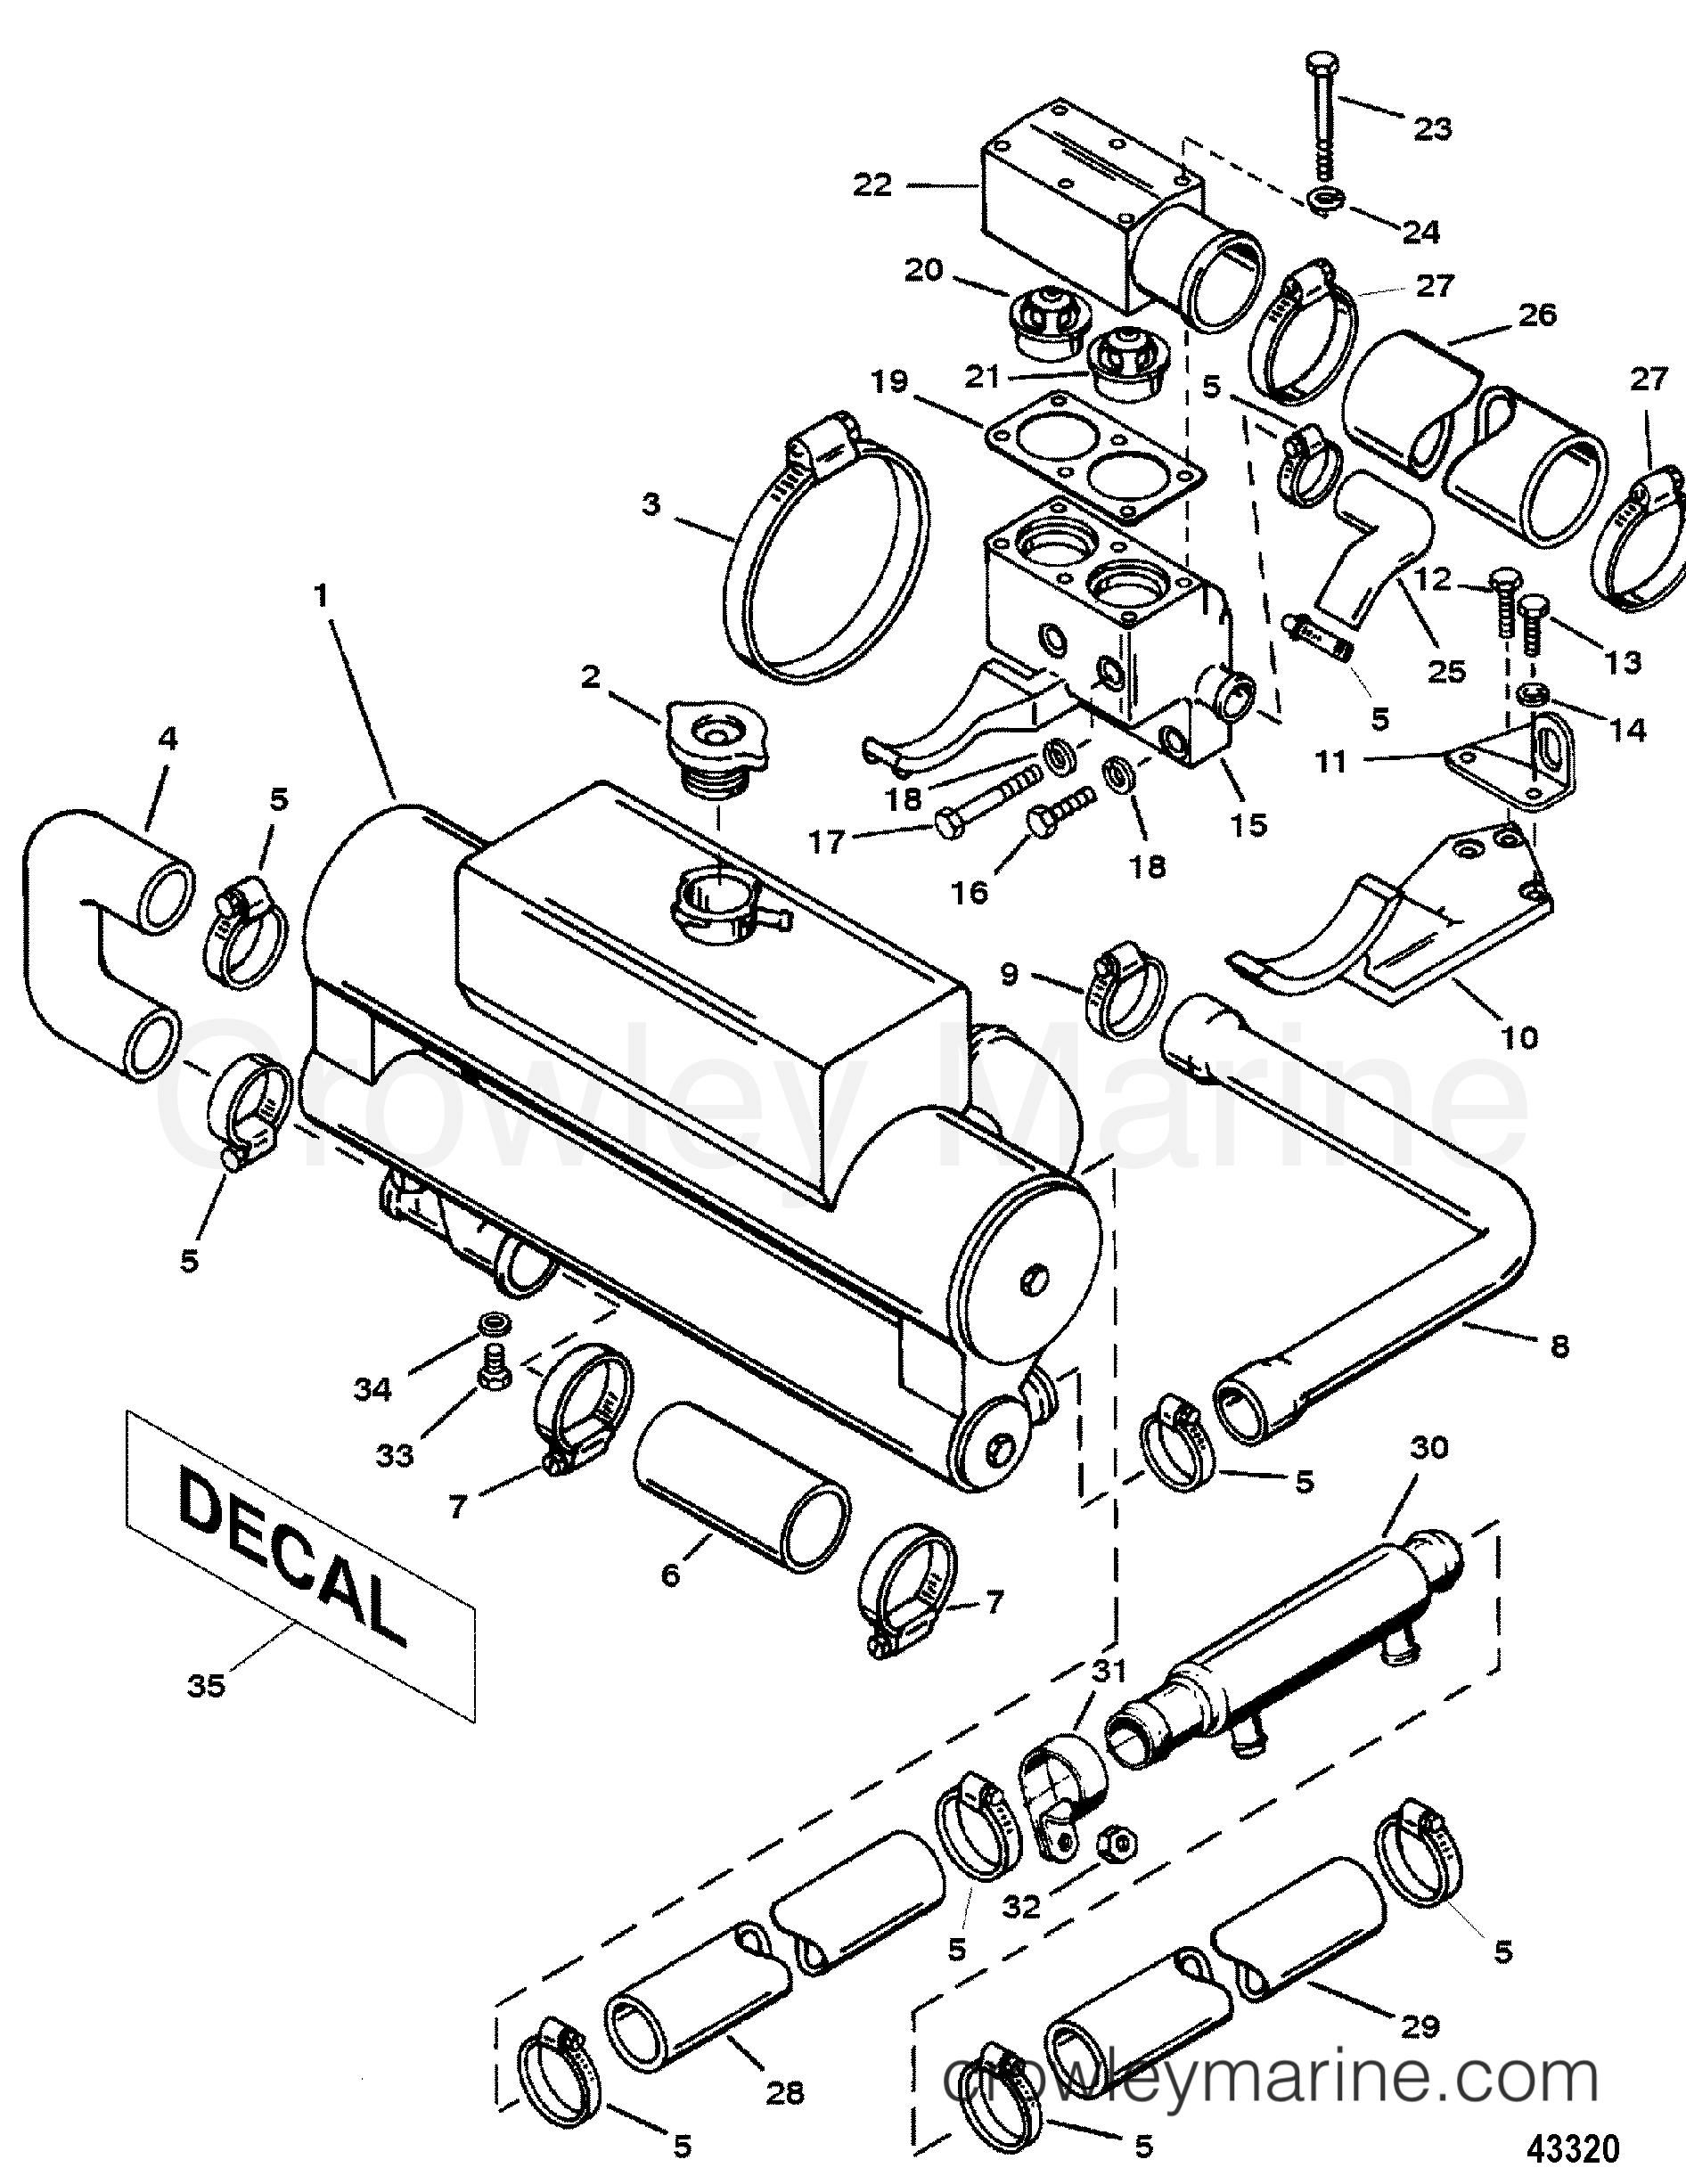 Excellent mercruiser engine diagram images best